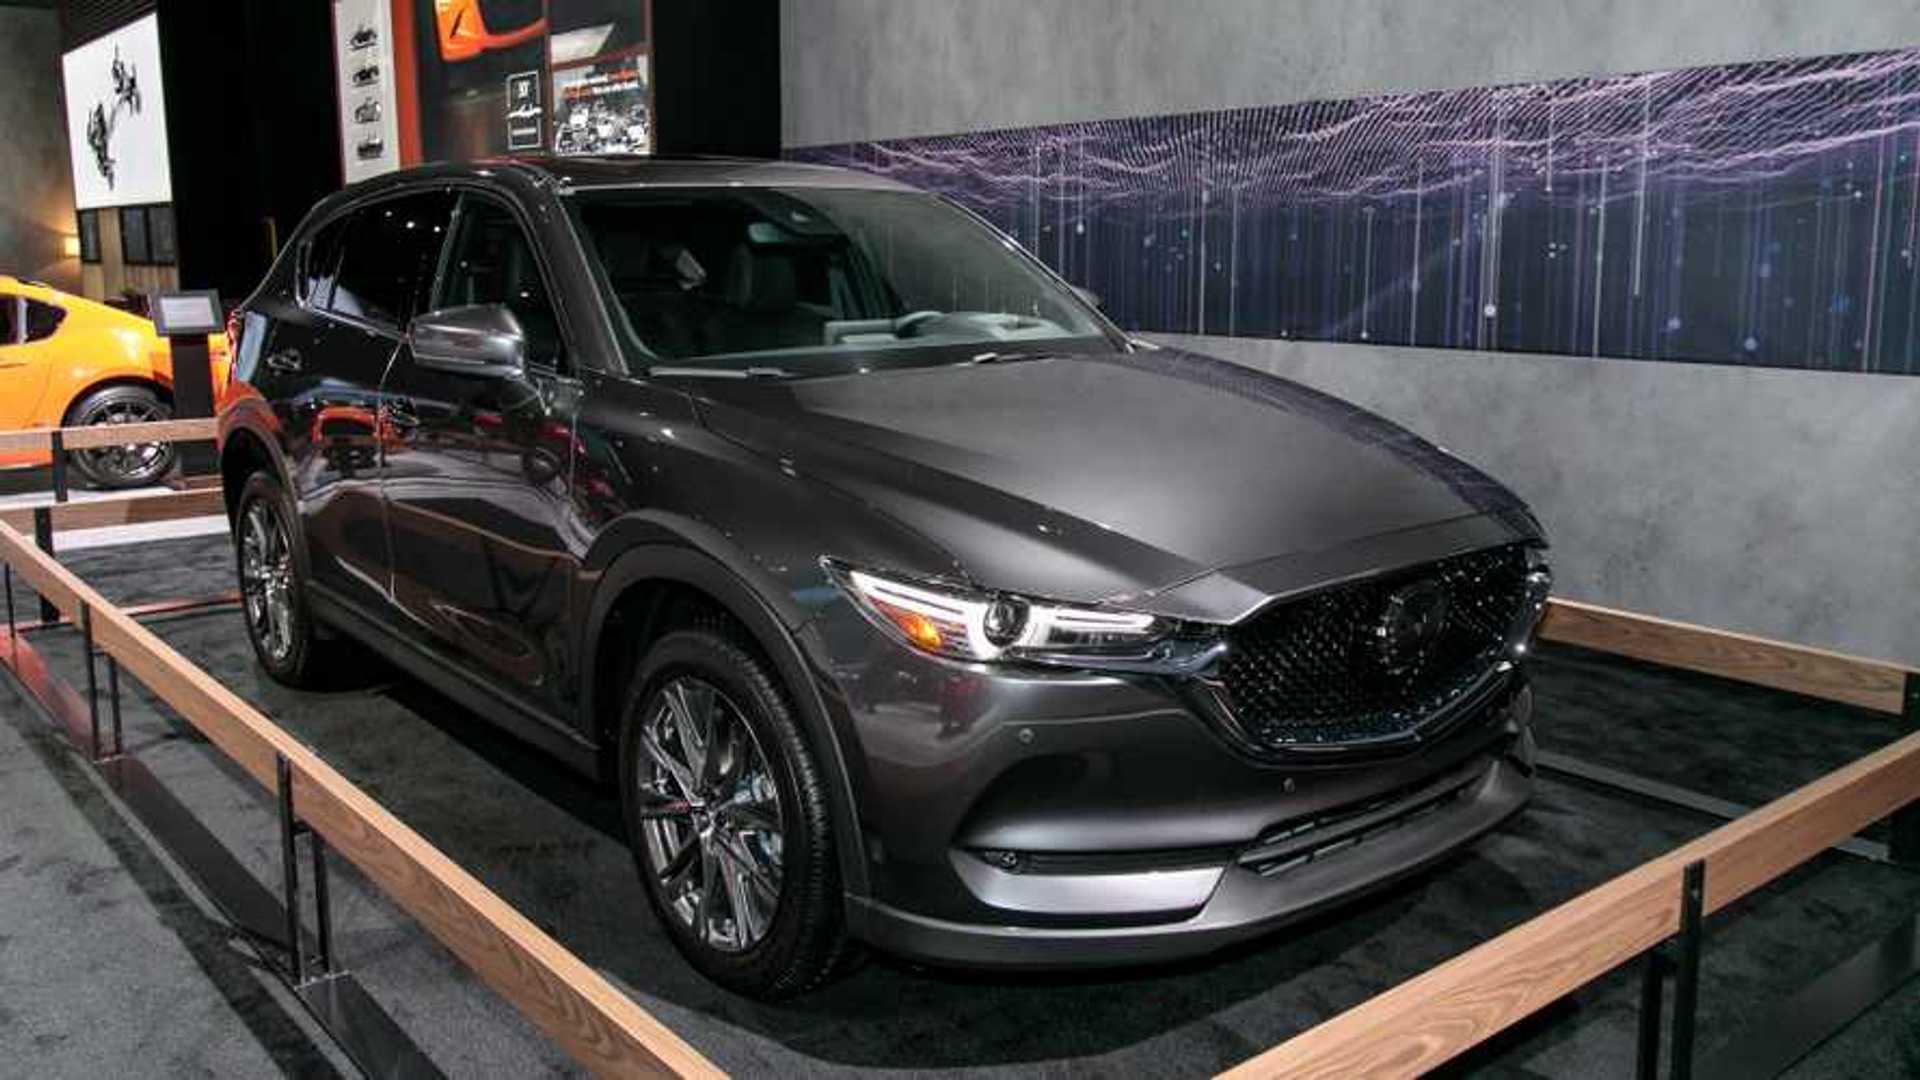 In Case You Hadn't Heard, The Mazda CX-5 Diesel Is Officially Dead